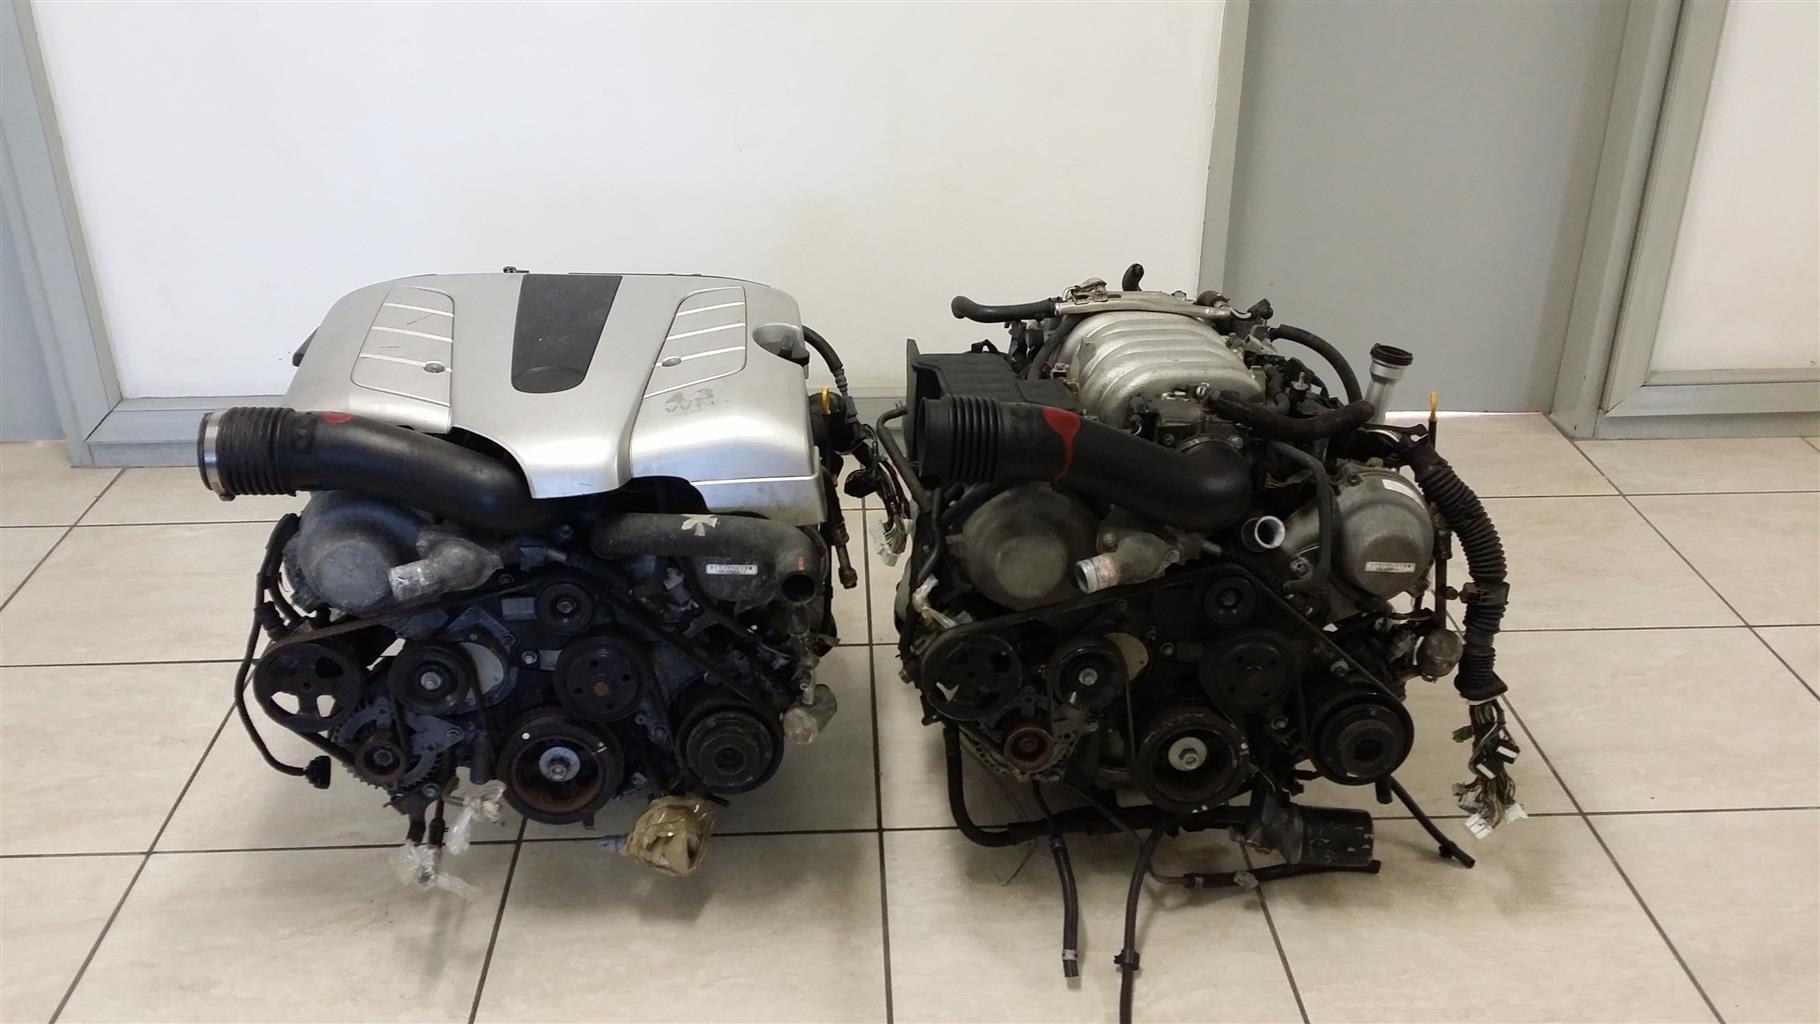 LEXUS V8 ENGINES FOR SALE @ LEXTREME!! 1UZ 4,0L and 3UZ 4